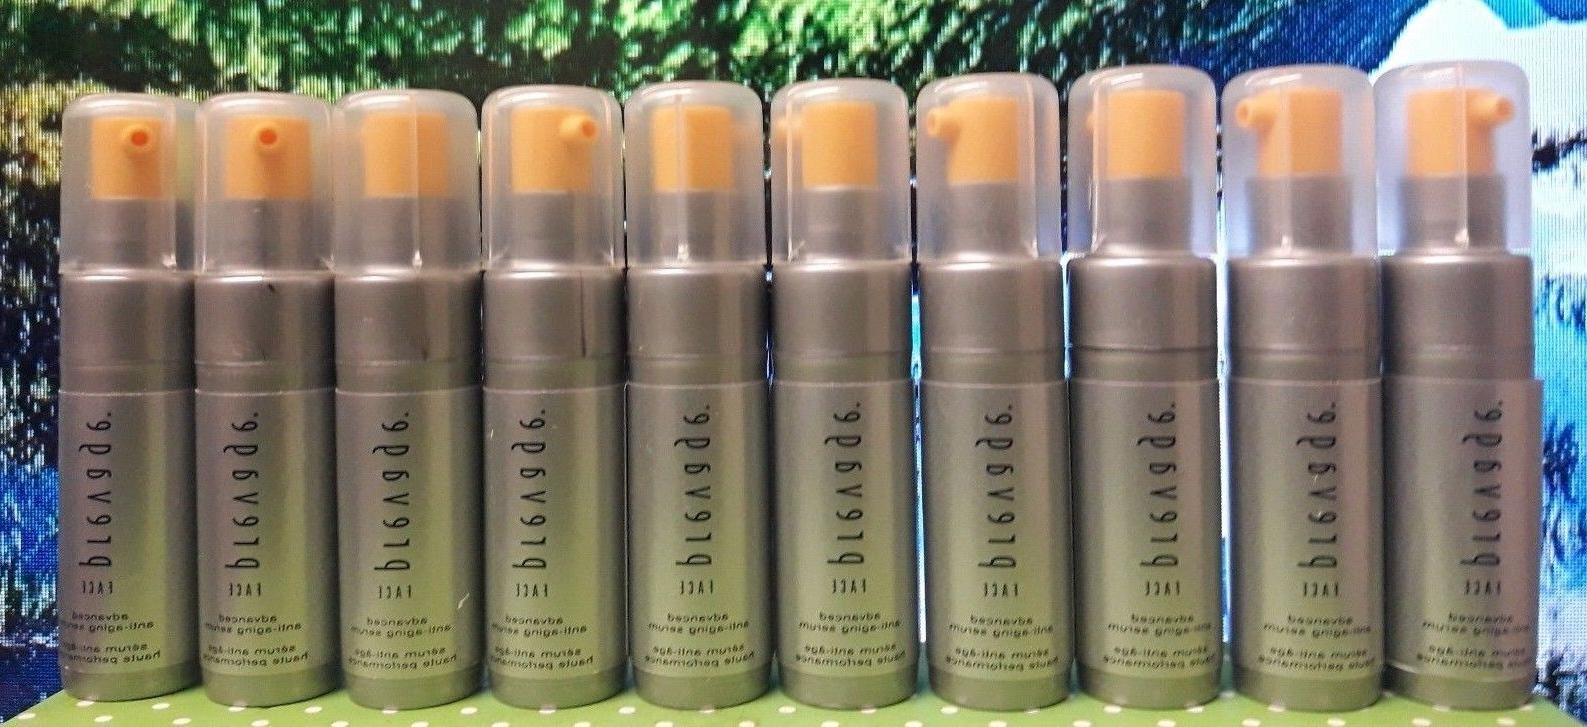 prevage face advanced anti aging serum 17